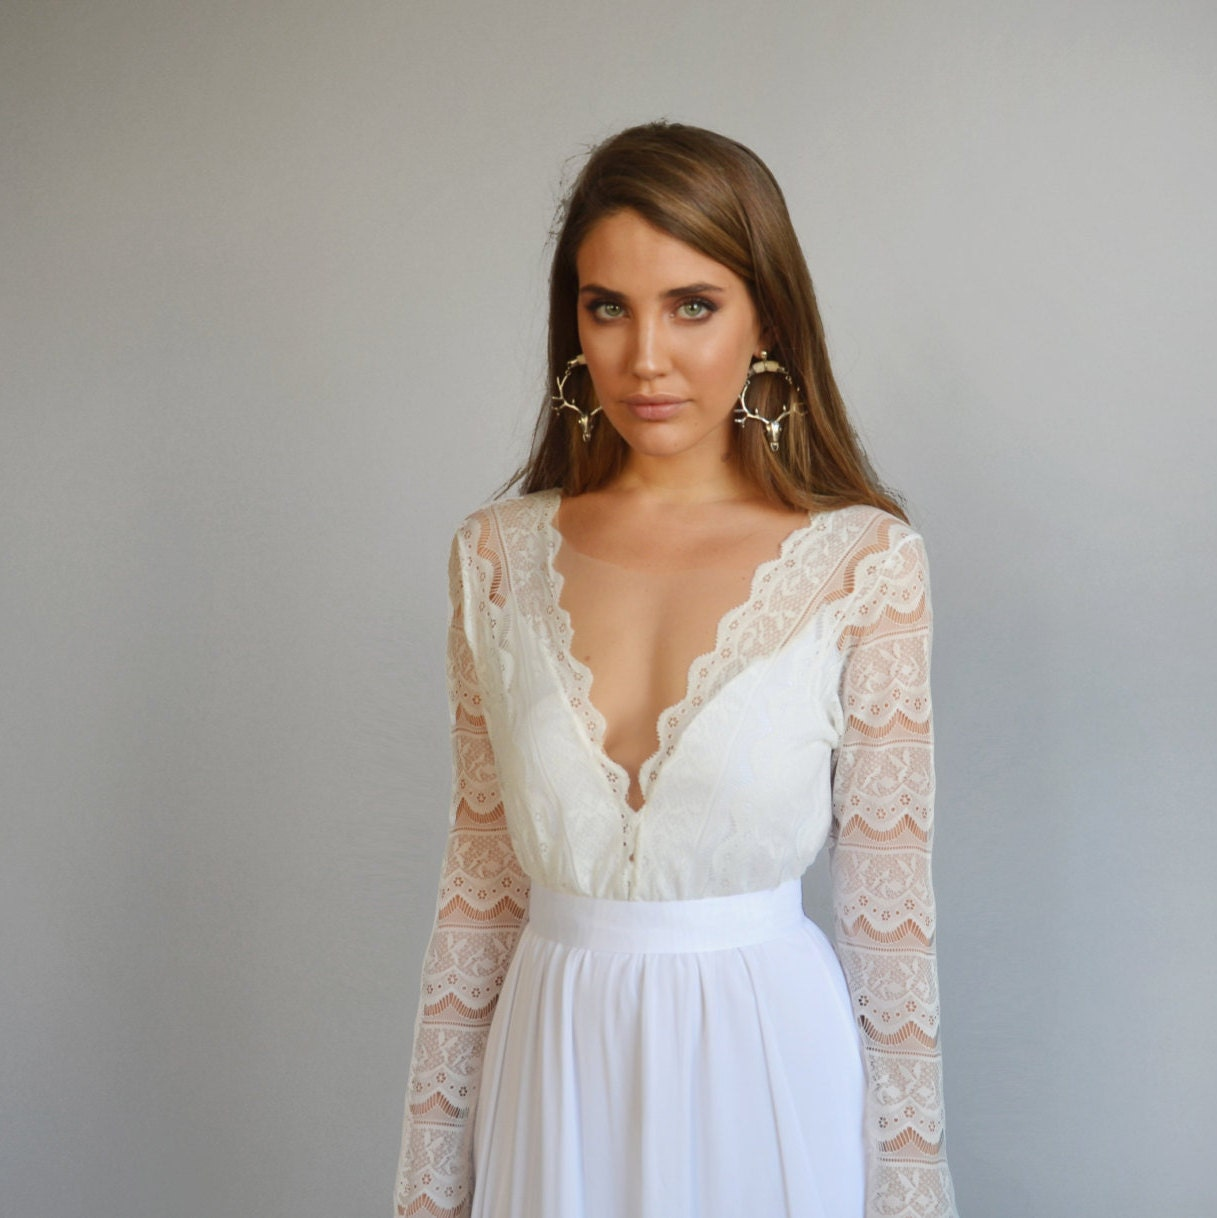 Lace wedding dress long sleeves wedding dress deep V neck